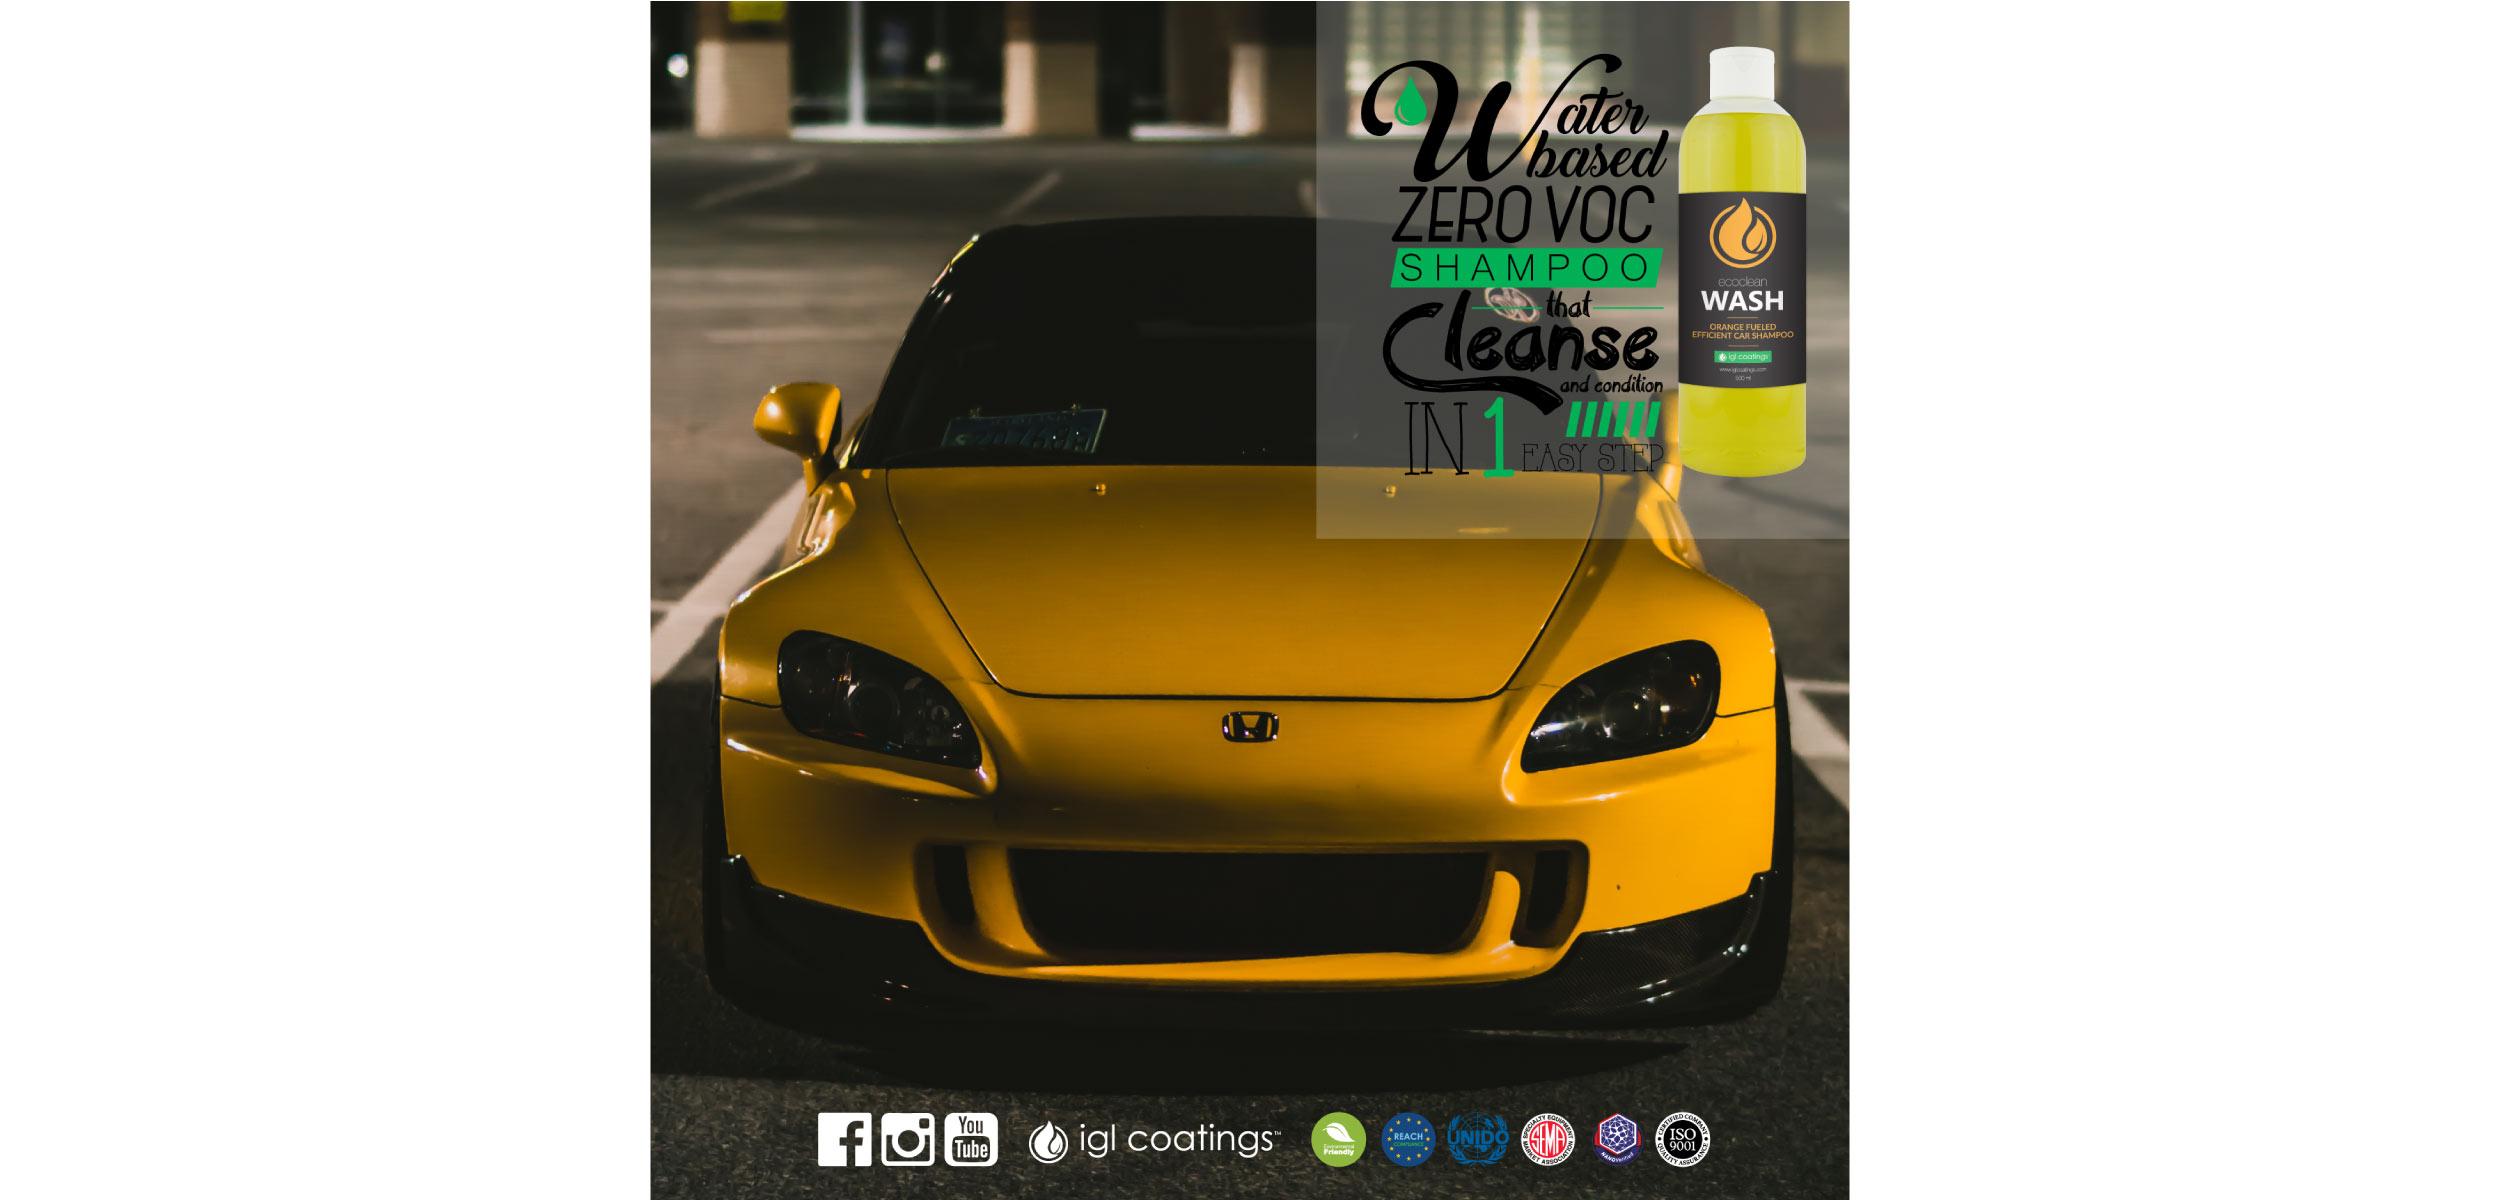 ecoclean-wash-dedicated-car-wash-shampoo-igl-coatings